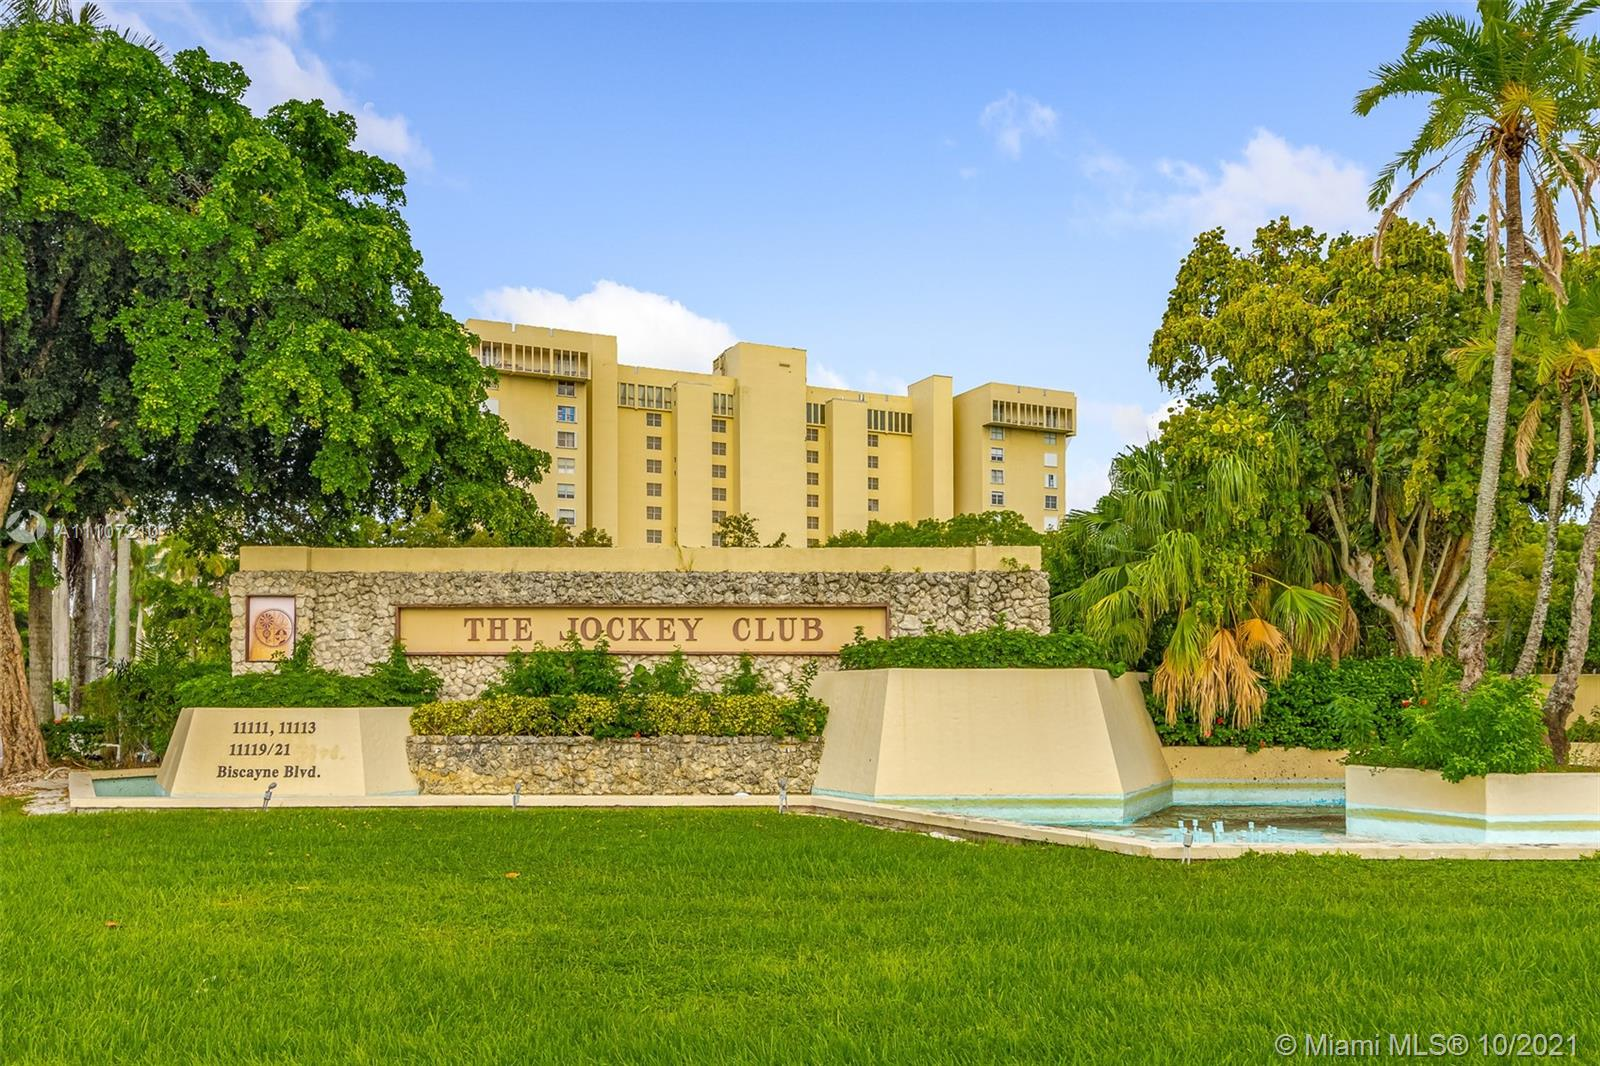 Jockey Club Building II #3B - 11111 Biscayne Blvd #3B, Miami, FL 33181